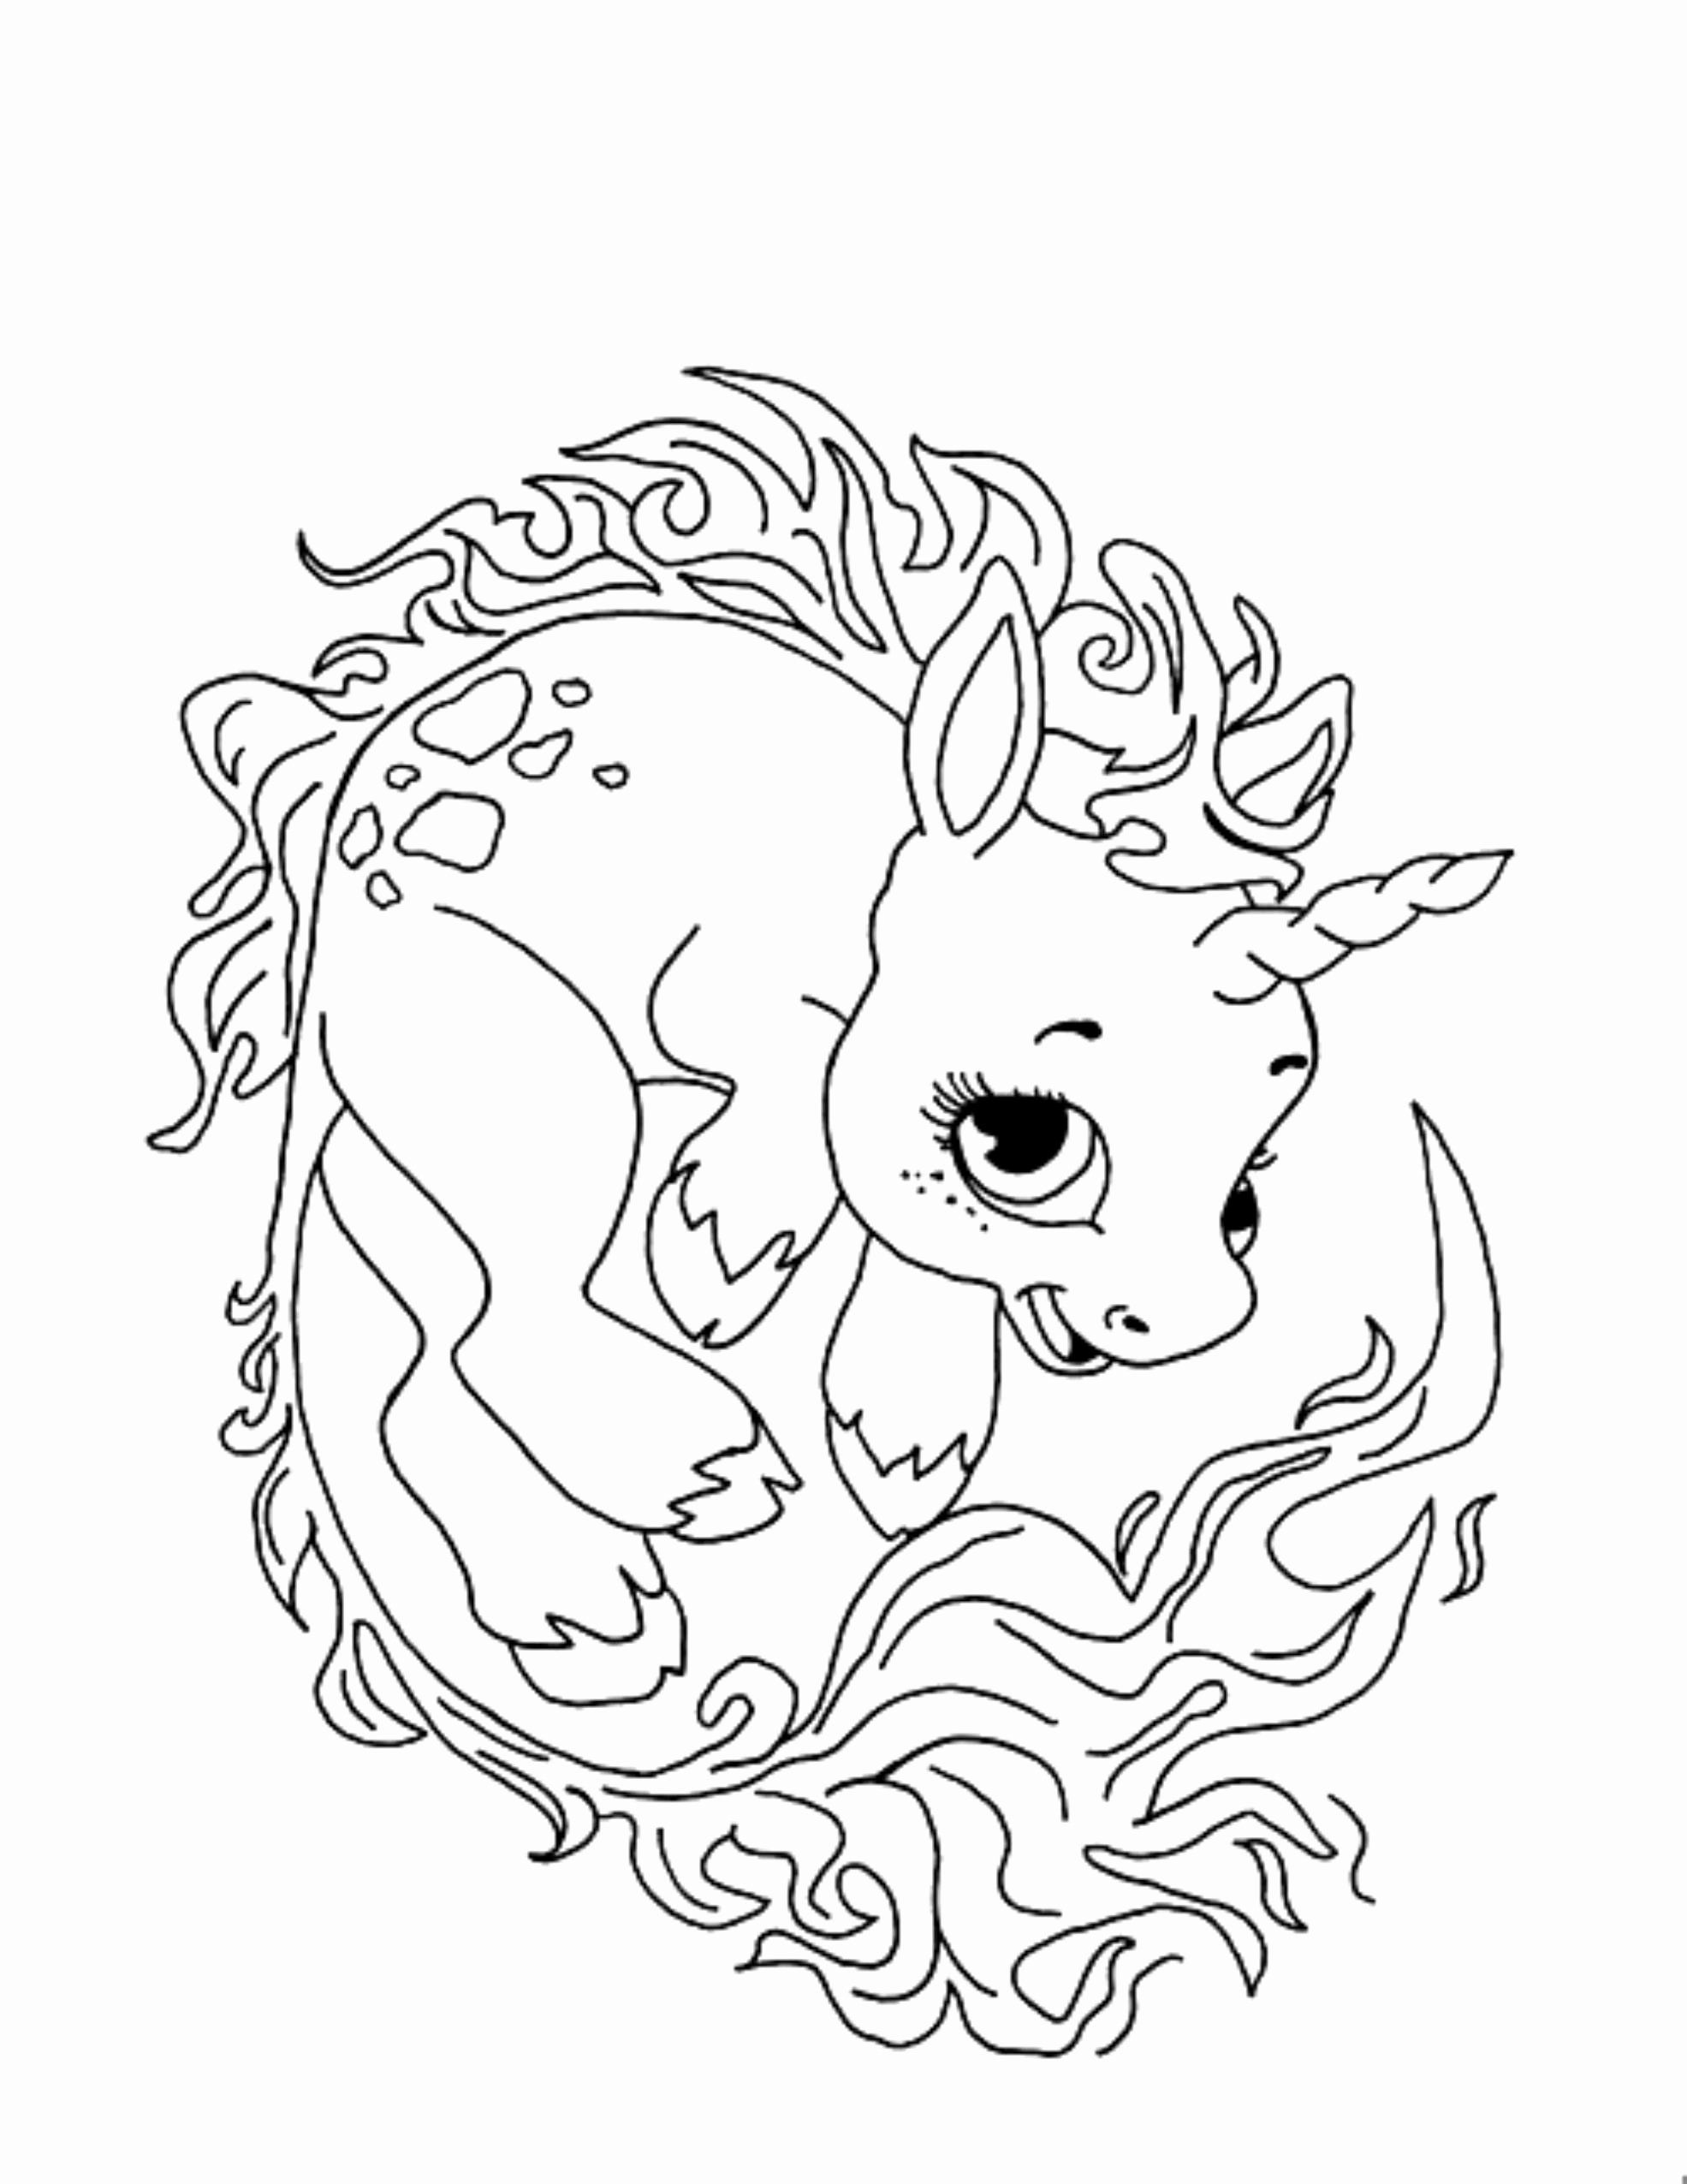 Coloring Sheets Of Unicorns Unique Baby Unicorn Coloring Pages Unicorn Coloring Pages Mermaid Coloring Pages Dragon Coloring Page